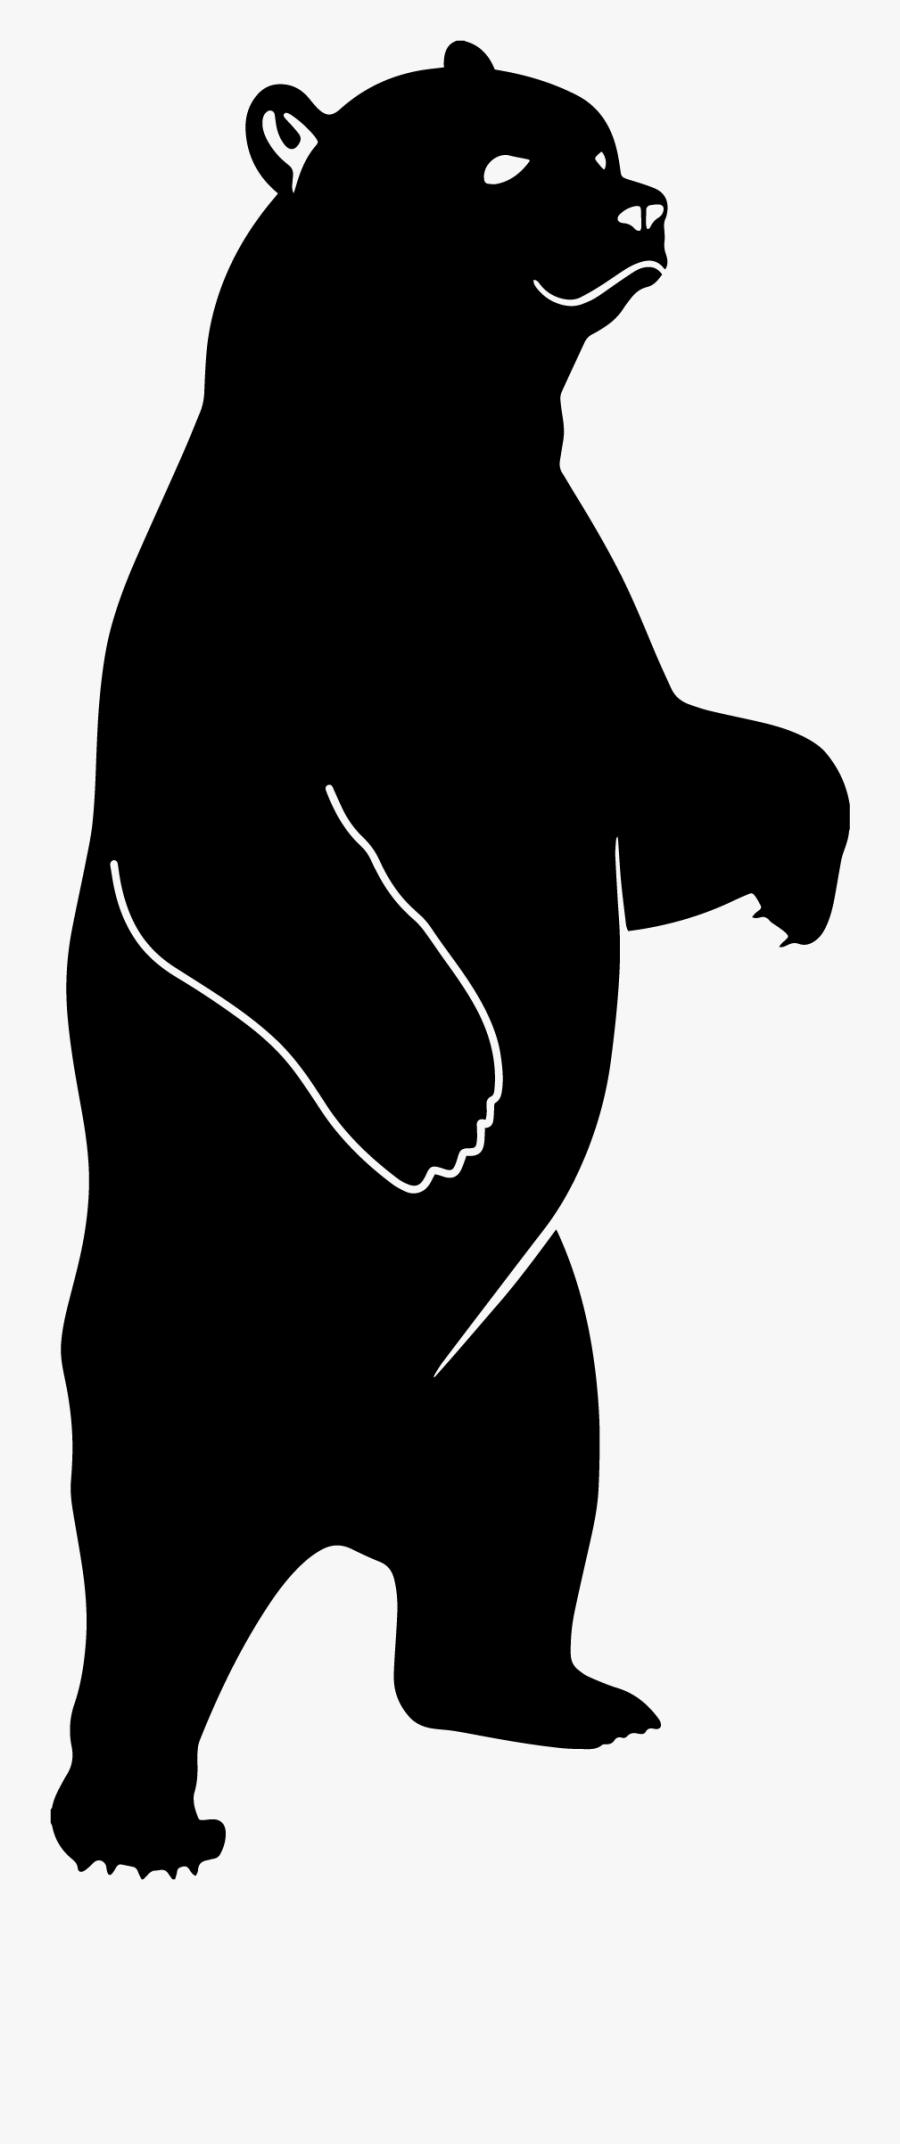 Bear Dxf, Transparent Clipart